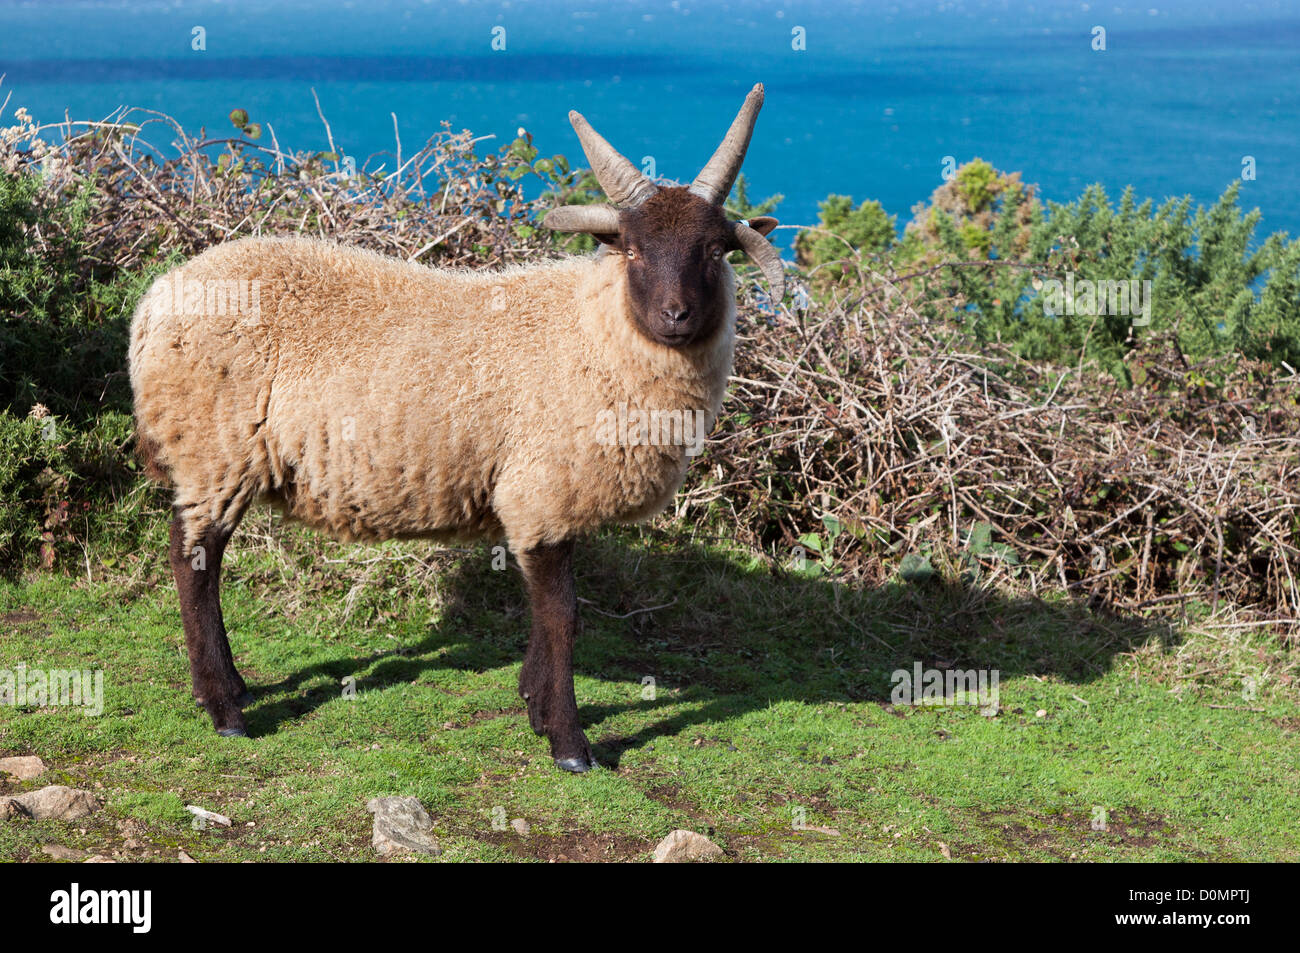 Manx Loaghtan sheep, Jersey, Channel Islands, UK - Stock Image